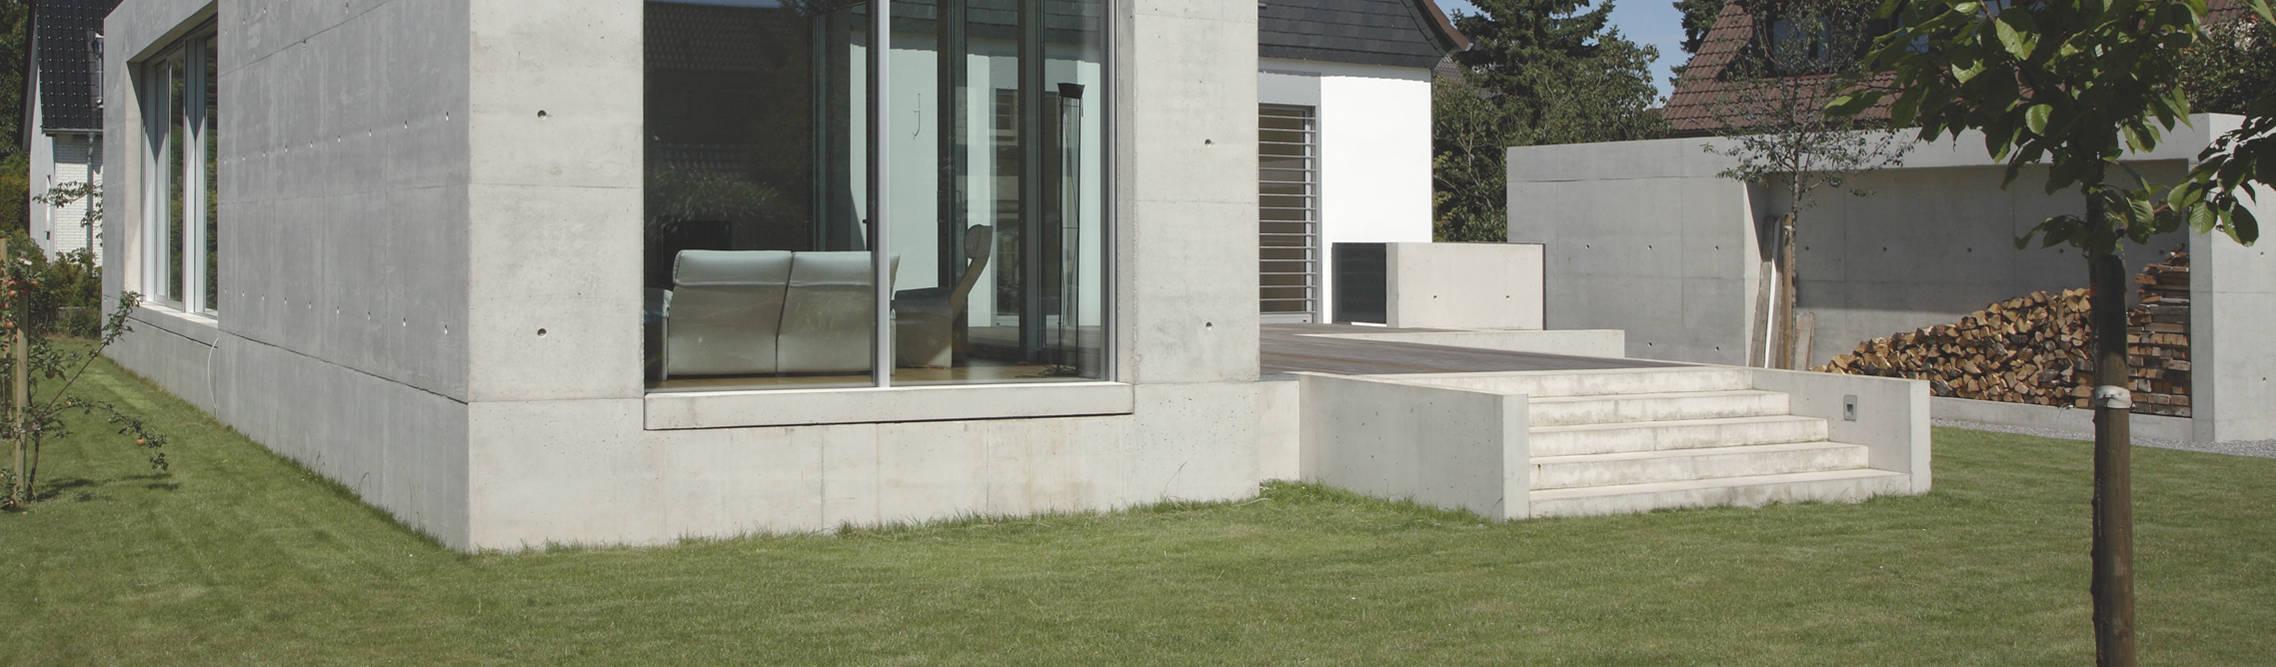 Oliver Keuper Architekt BDA